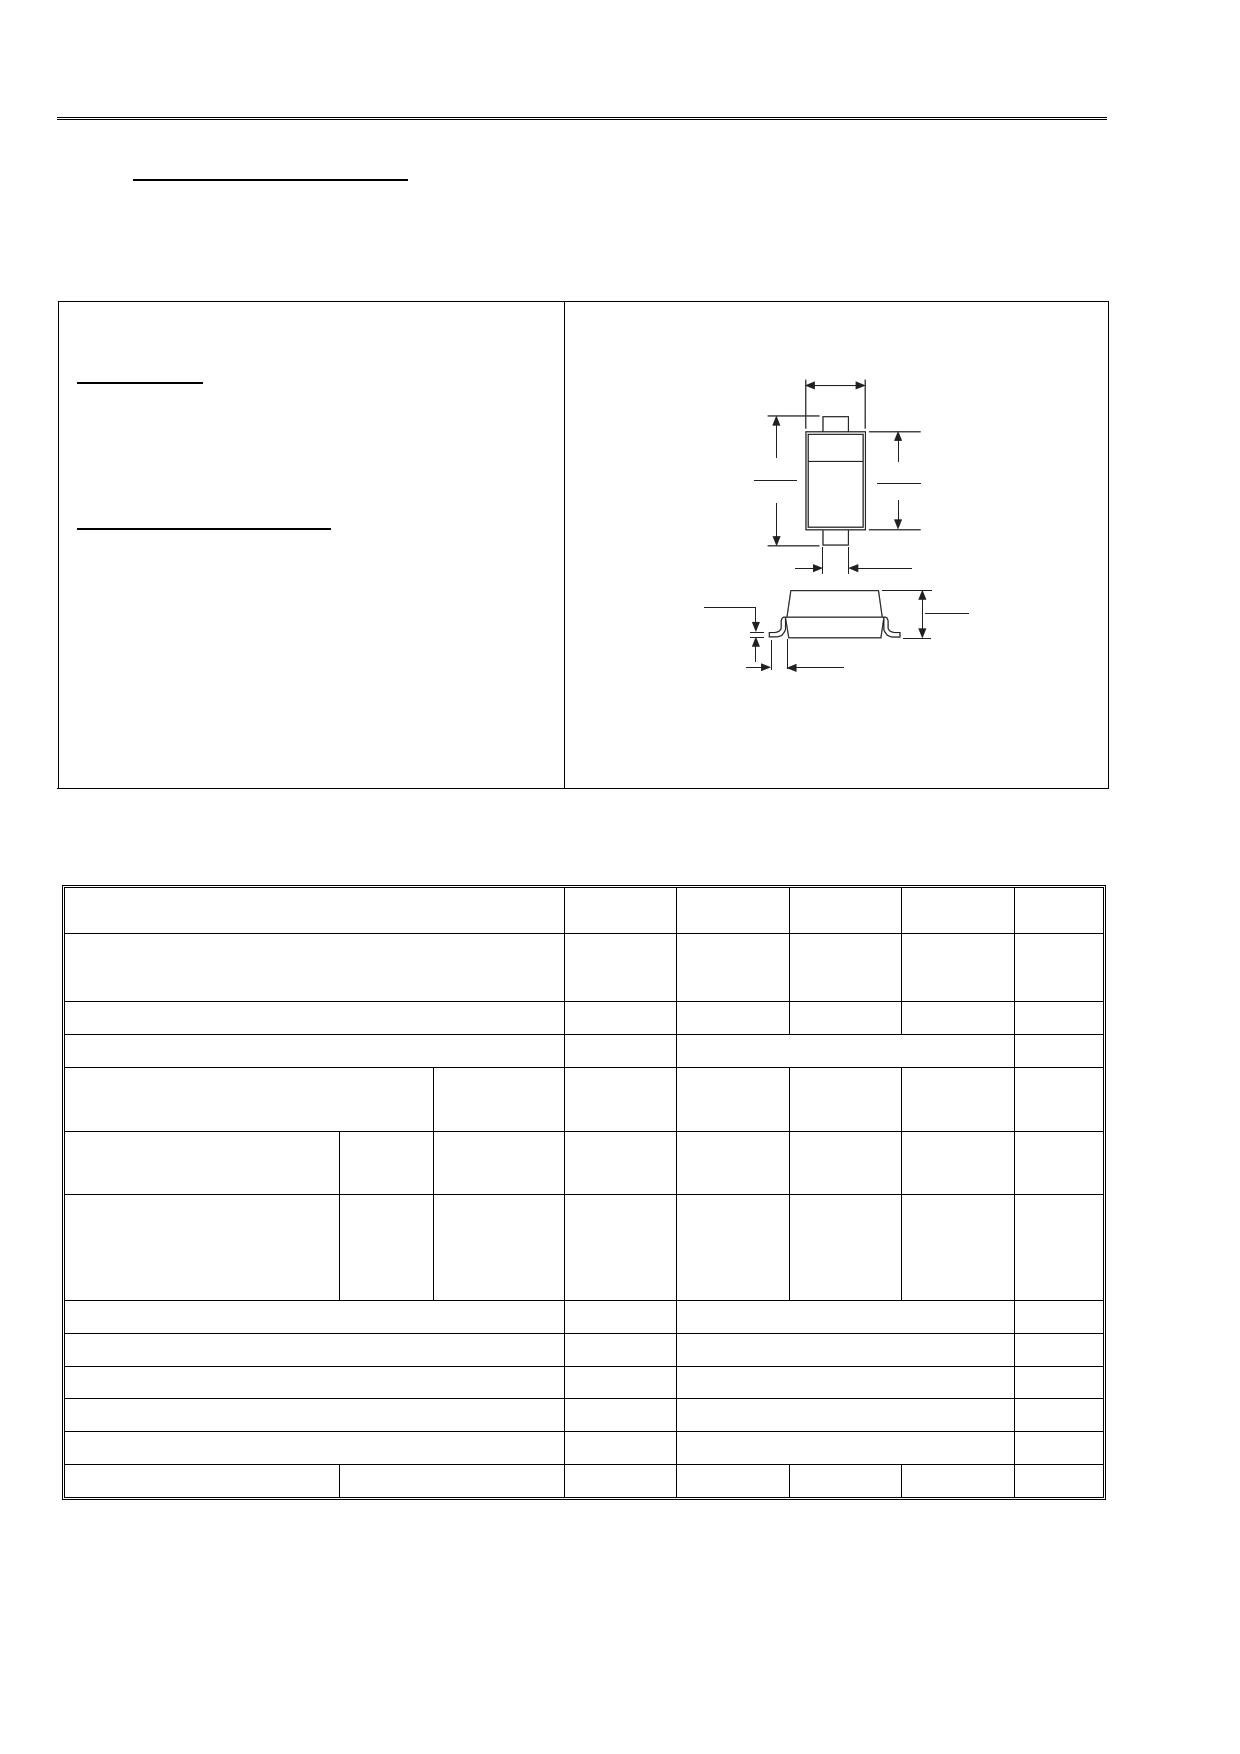 B0530W datasheet